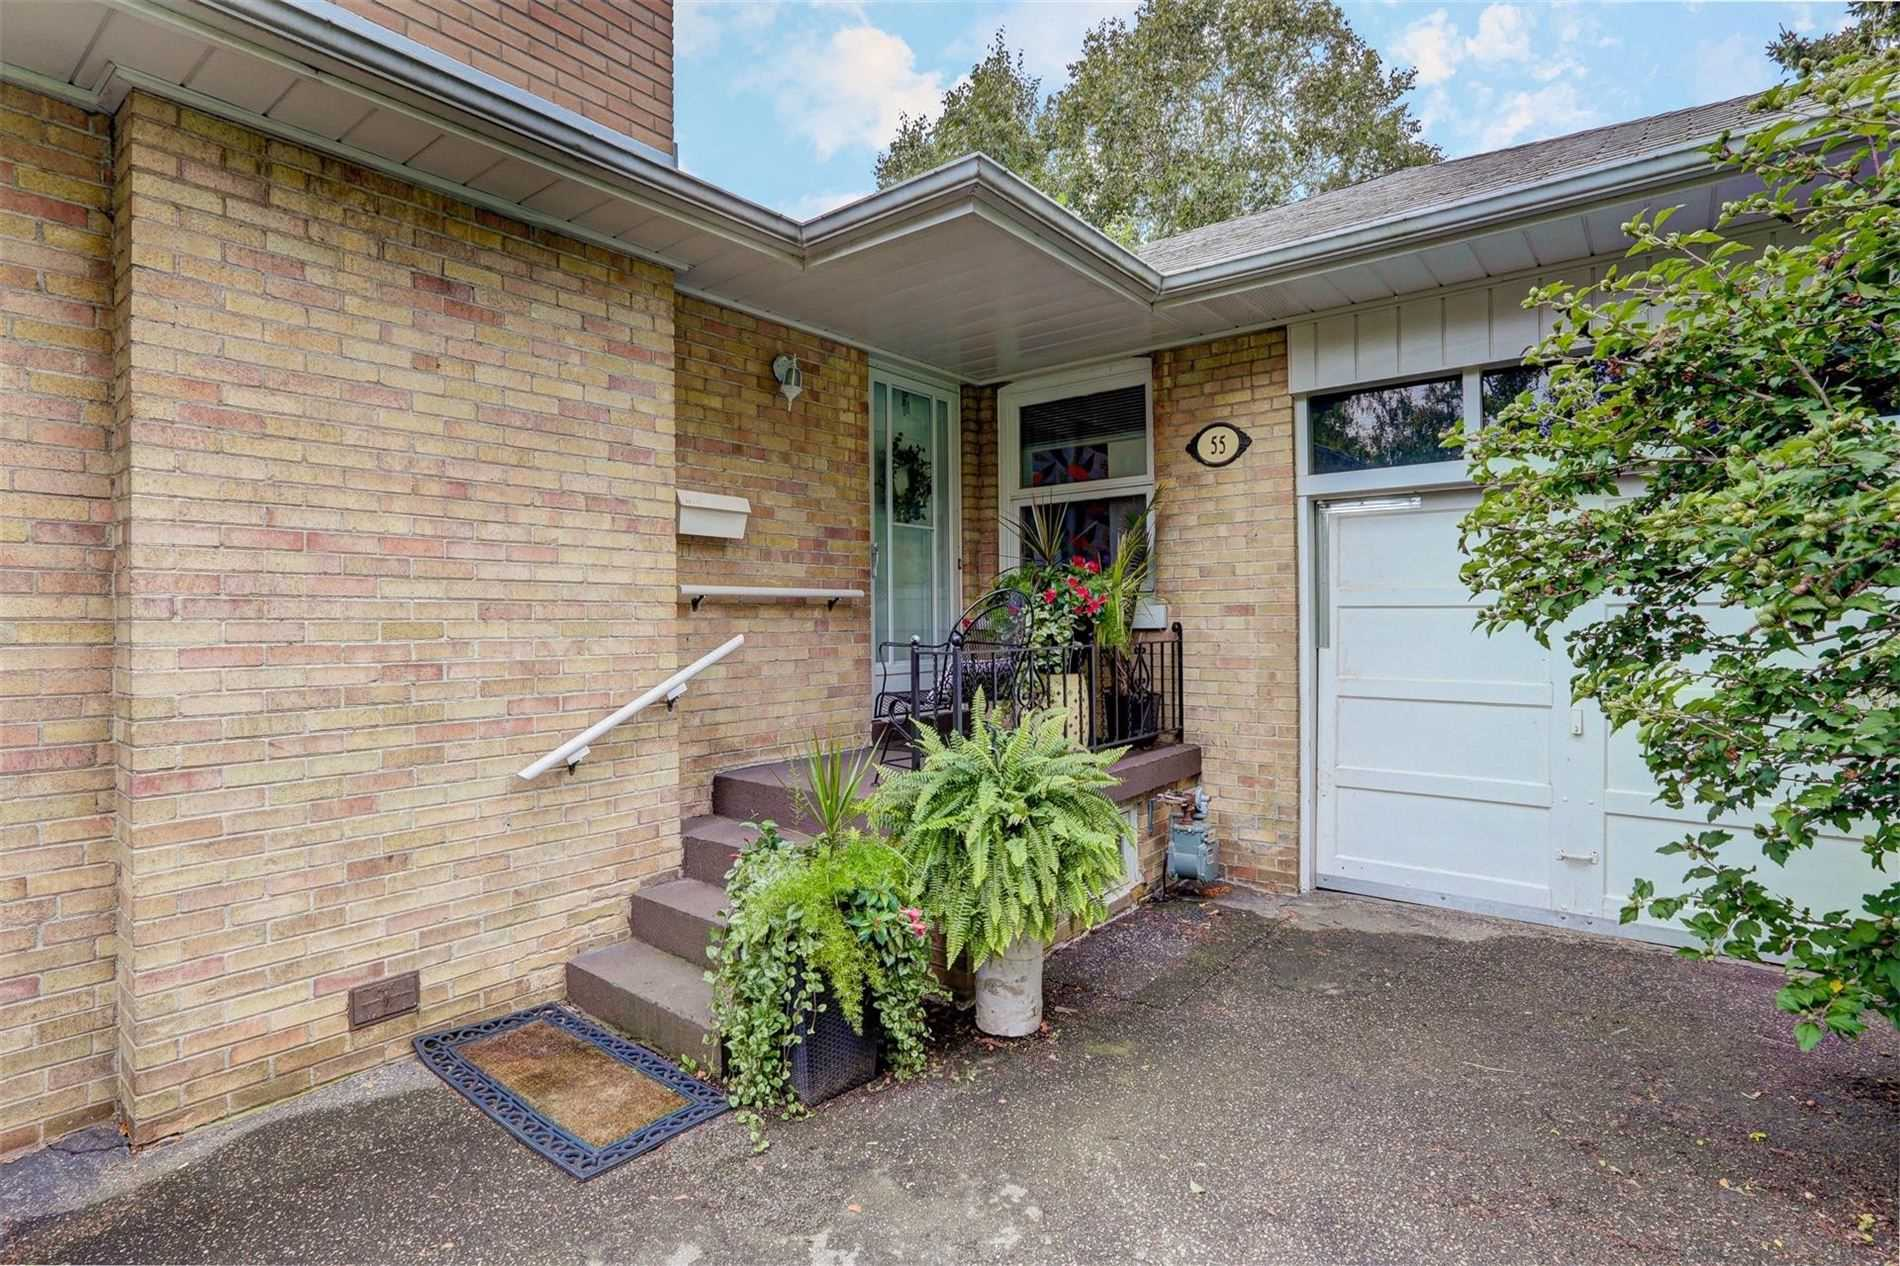 55 Cardigan Rd, Toronto, Ontario (ID W4580968)